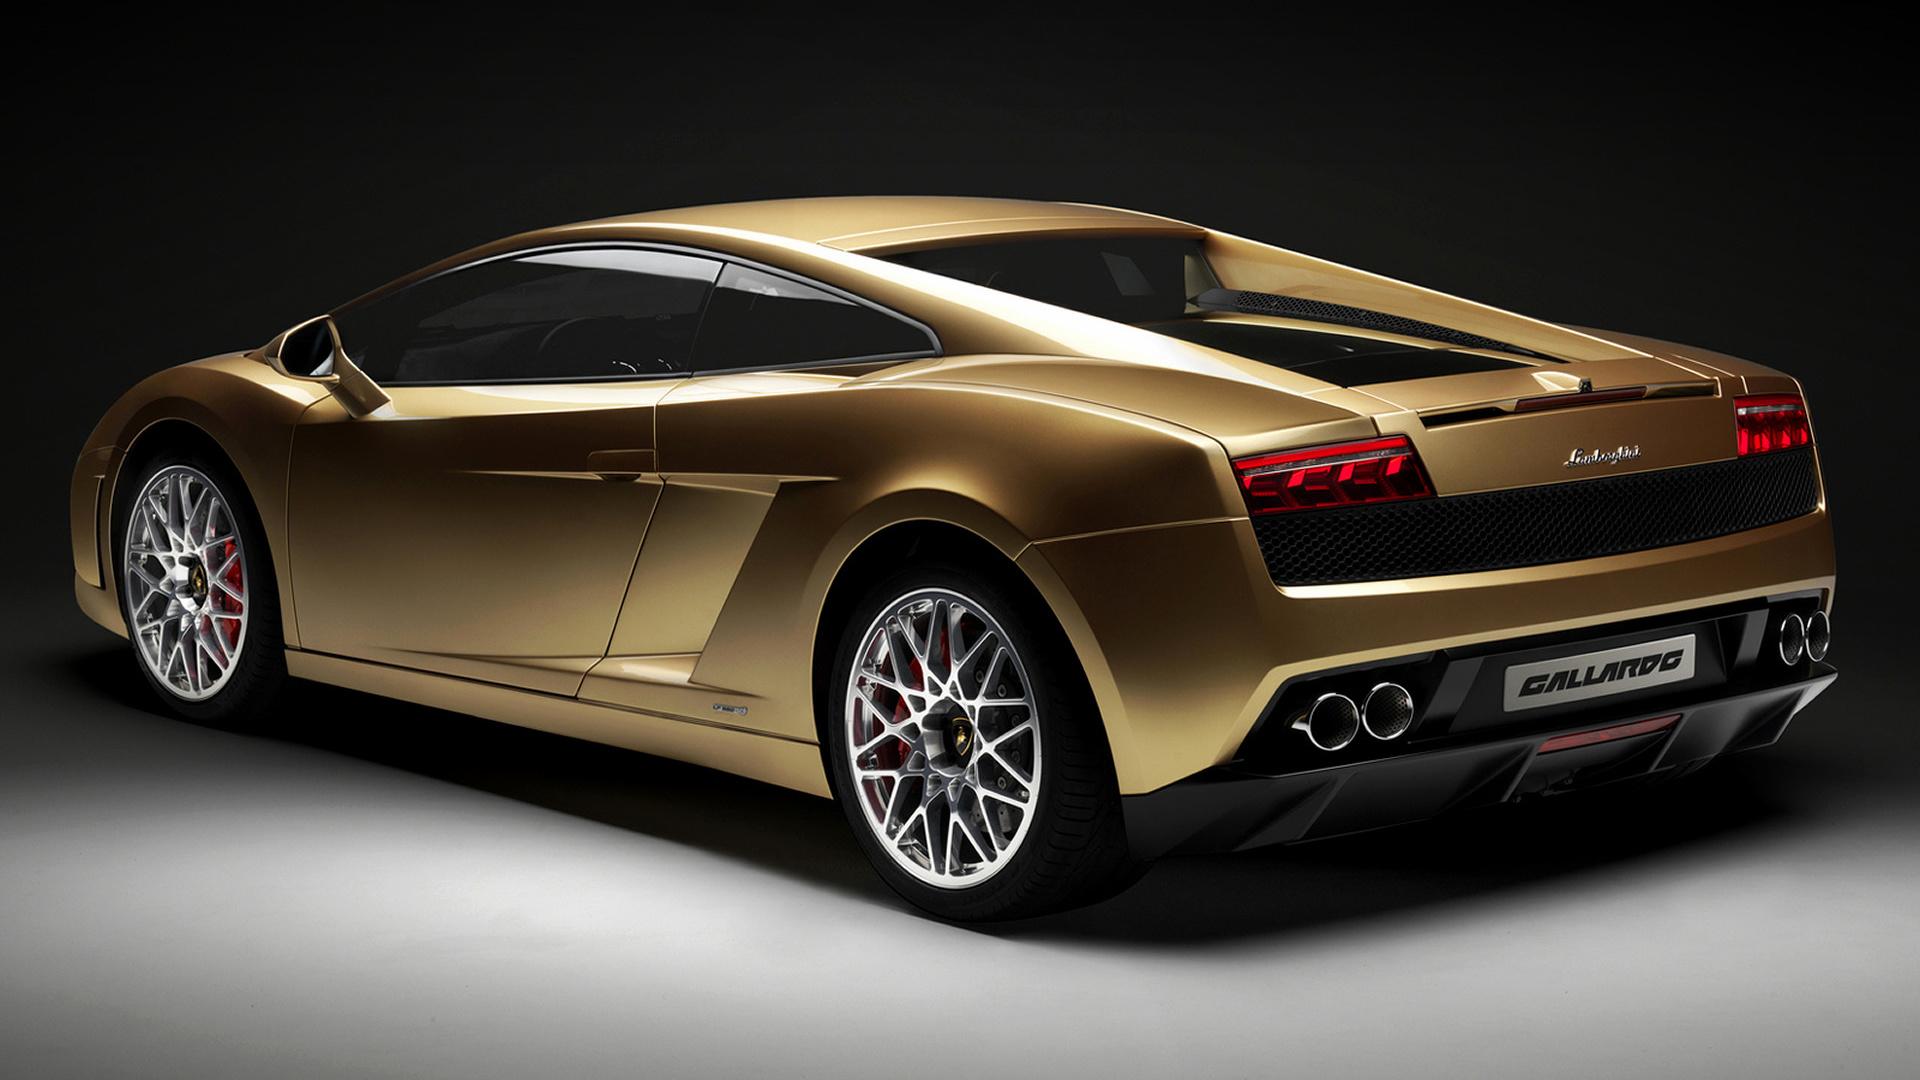 Lamborghini Gallardo Lp 560 4 Gold Edition 2012 Cn